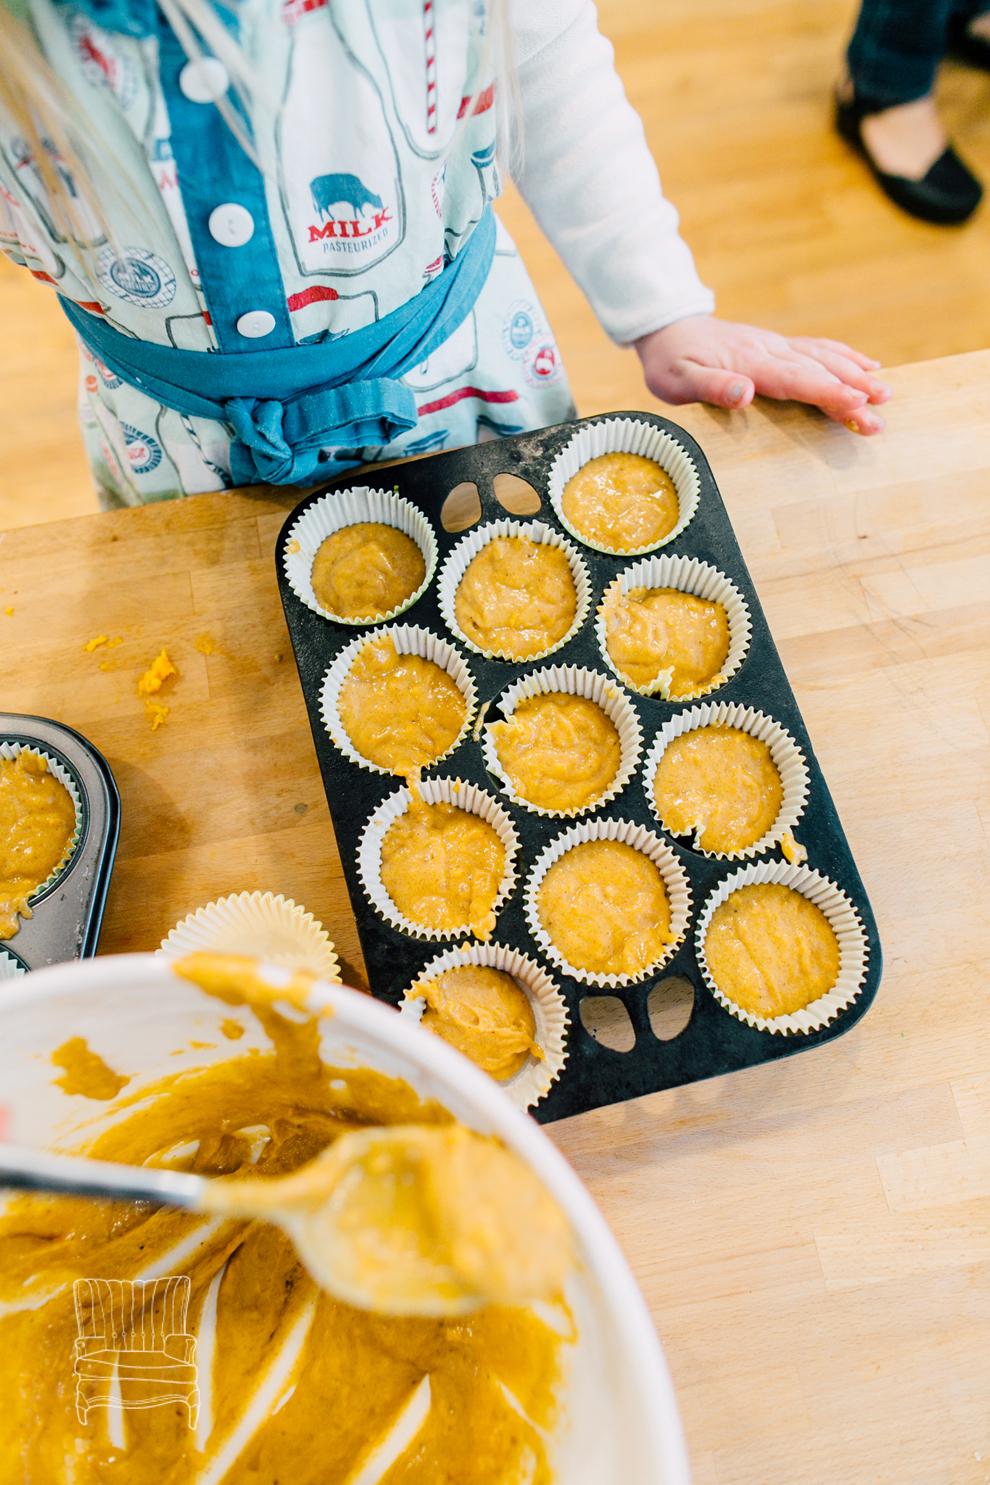 017-bellingham-family-lifestyle-photographer-katheryn-moran-kitchen-baking-pippin.jpg